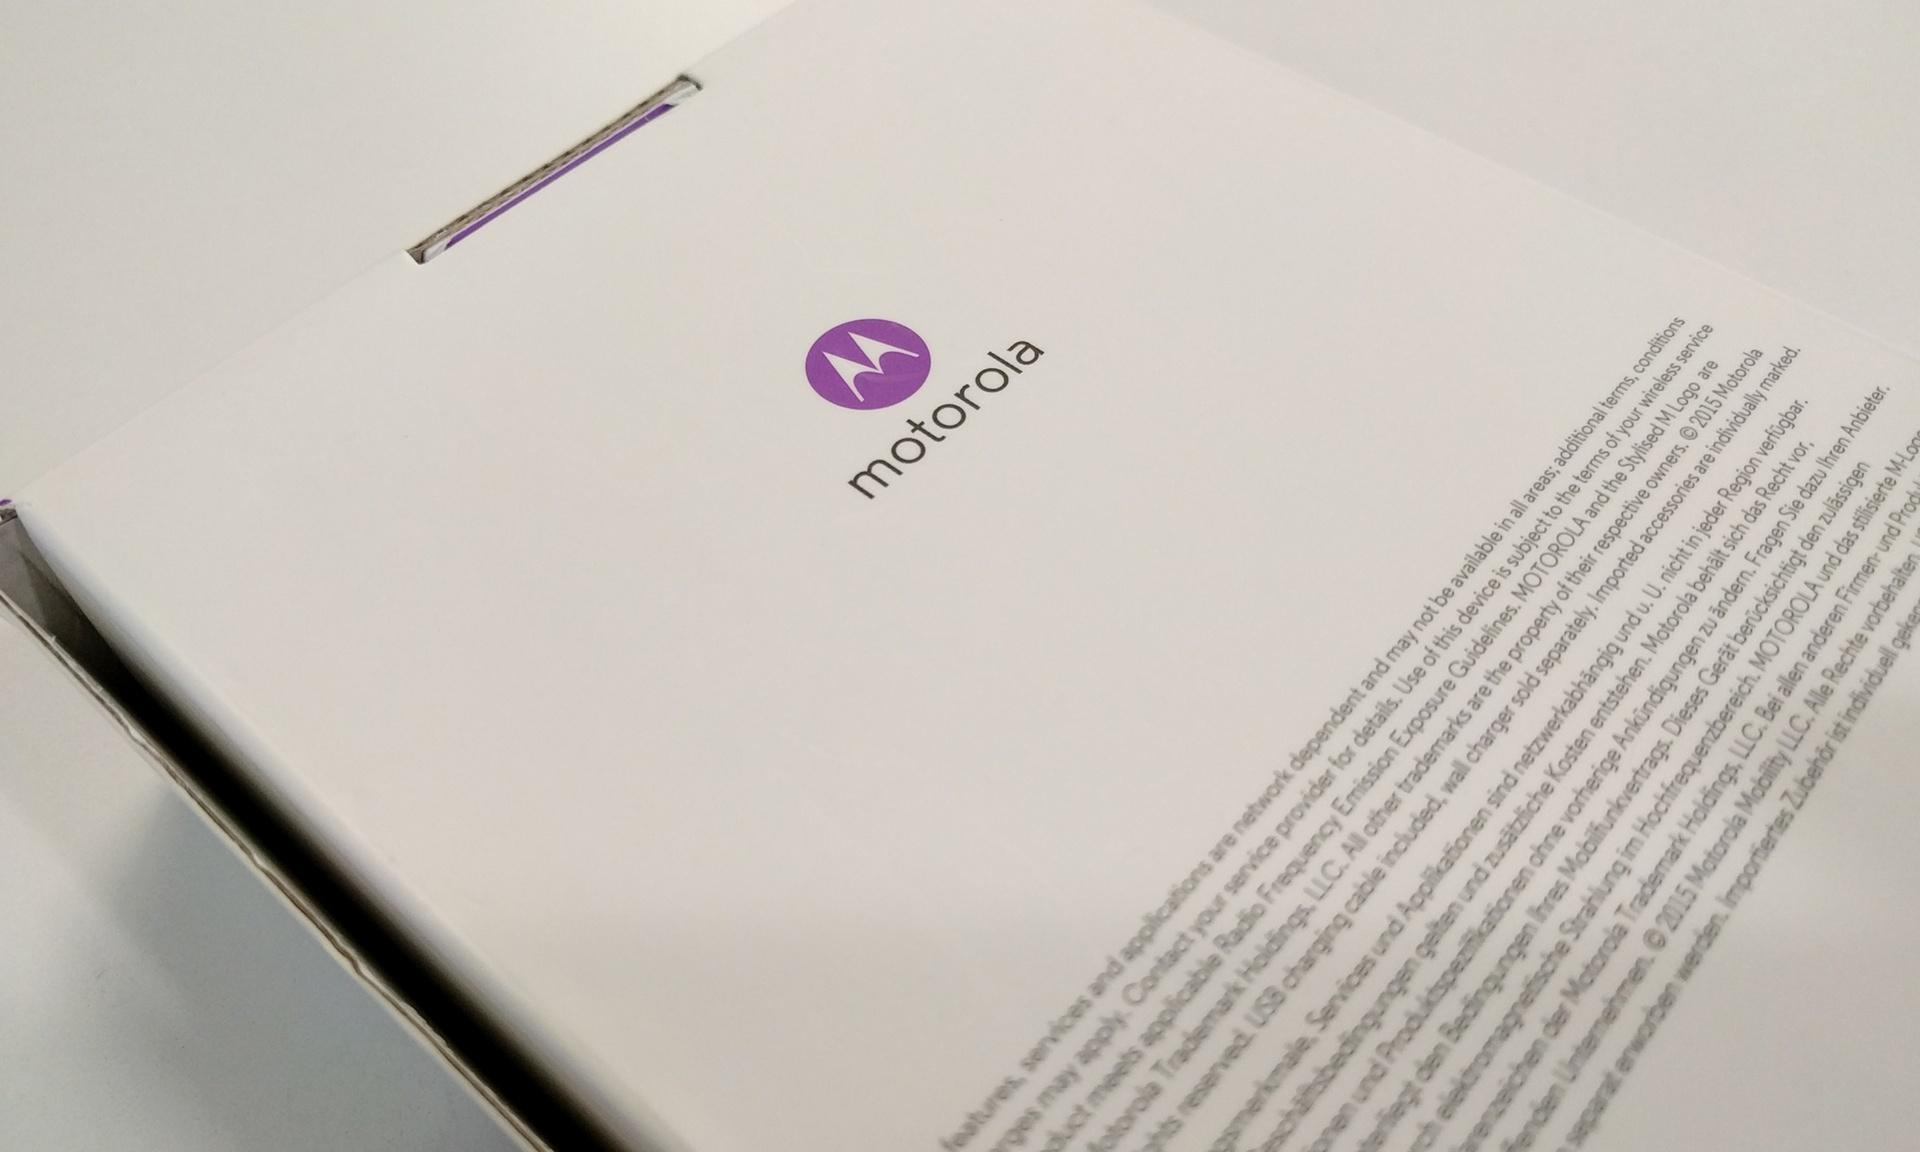 Lenovo acaba com o nome da marca Motorola e deixa de existir 1